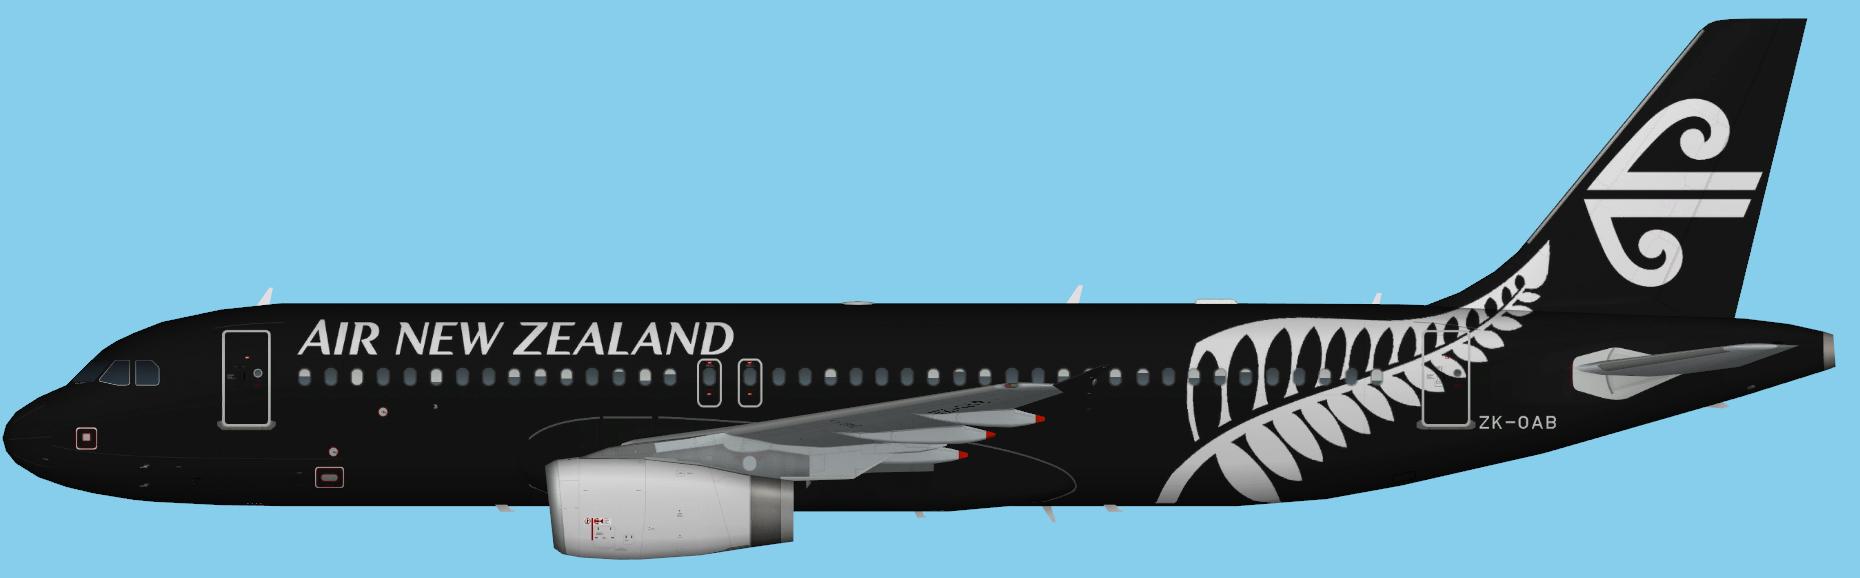 Air New Zealand | JCAI